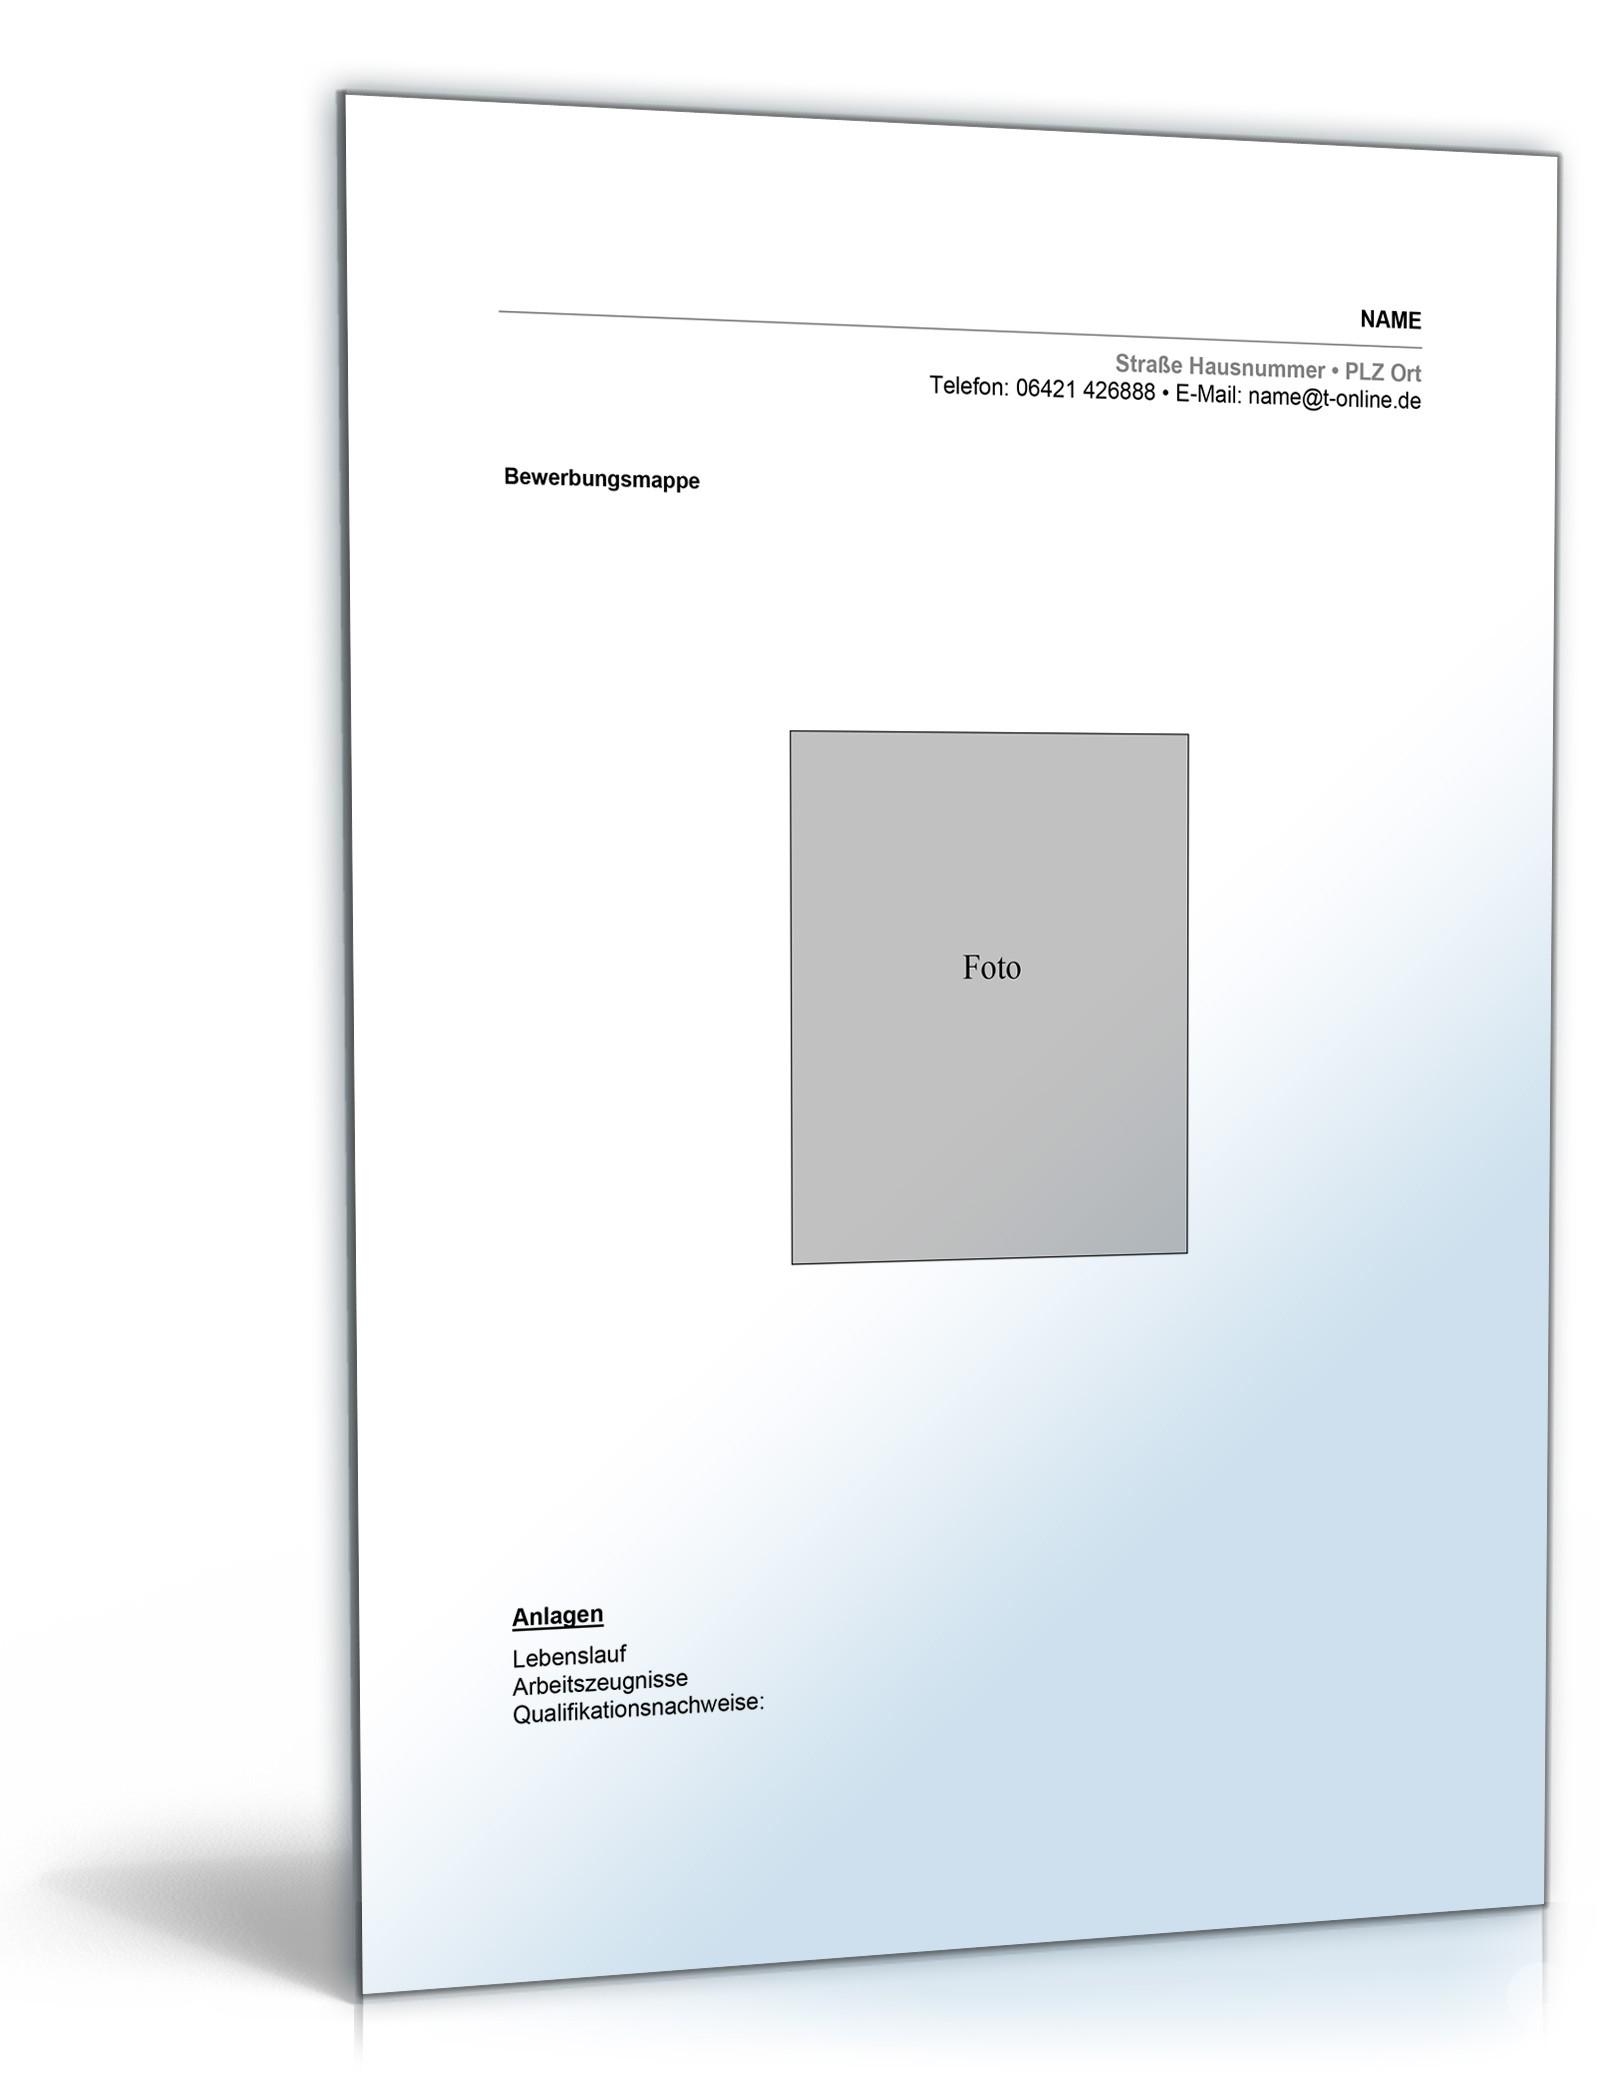 Fein Lebenslauf Hochschulabschluss Ideen - Entry Level Resume ...